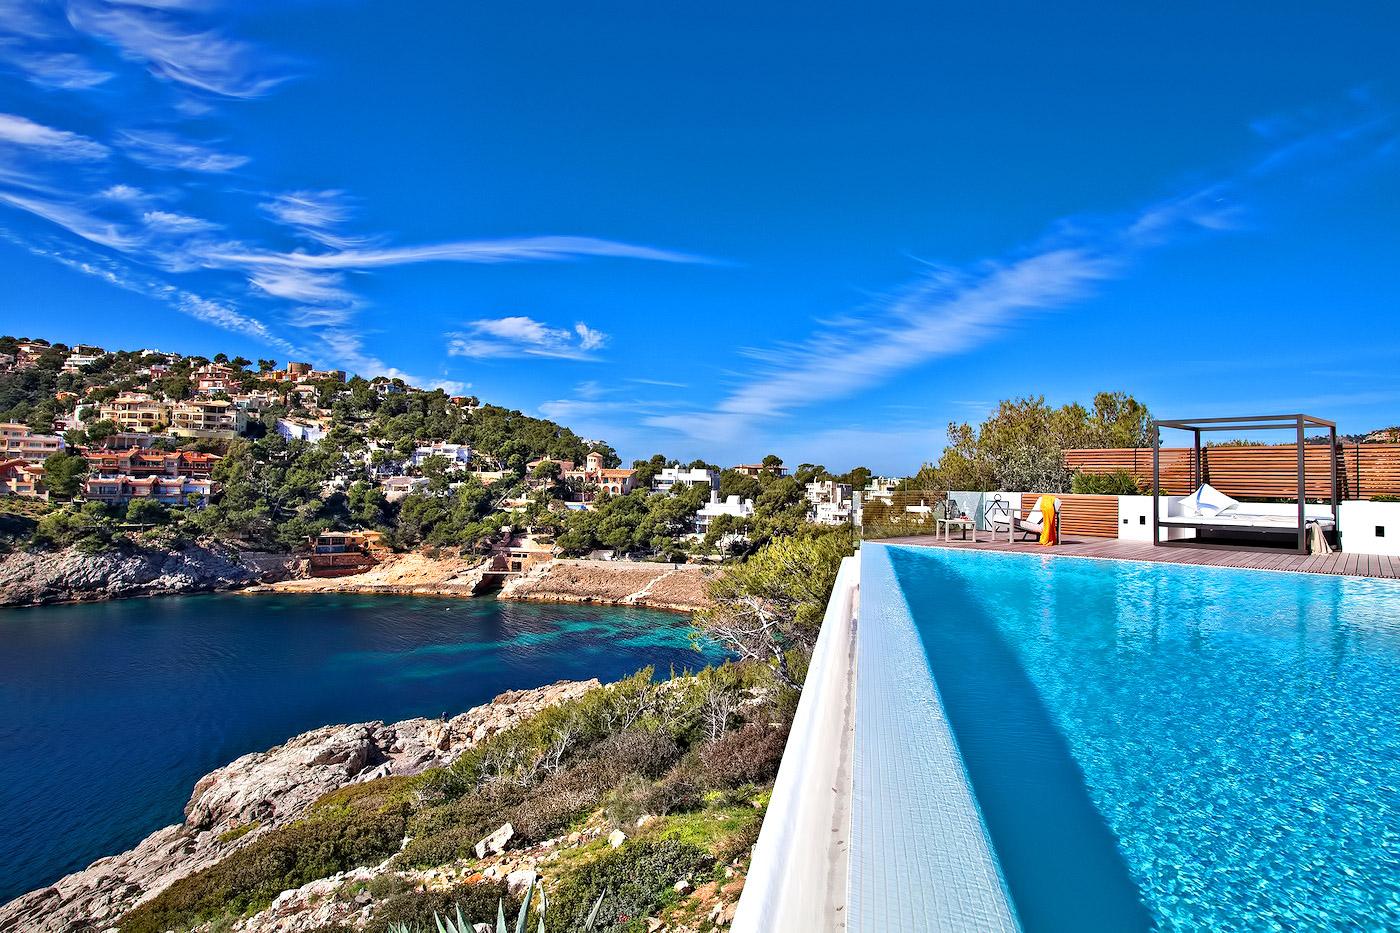 Villa Marmacen II – Cala Marmacen, Port d'Andratx, Mallorca, Balearic Islands, Spain